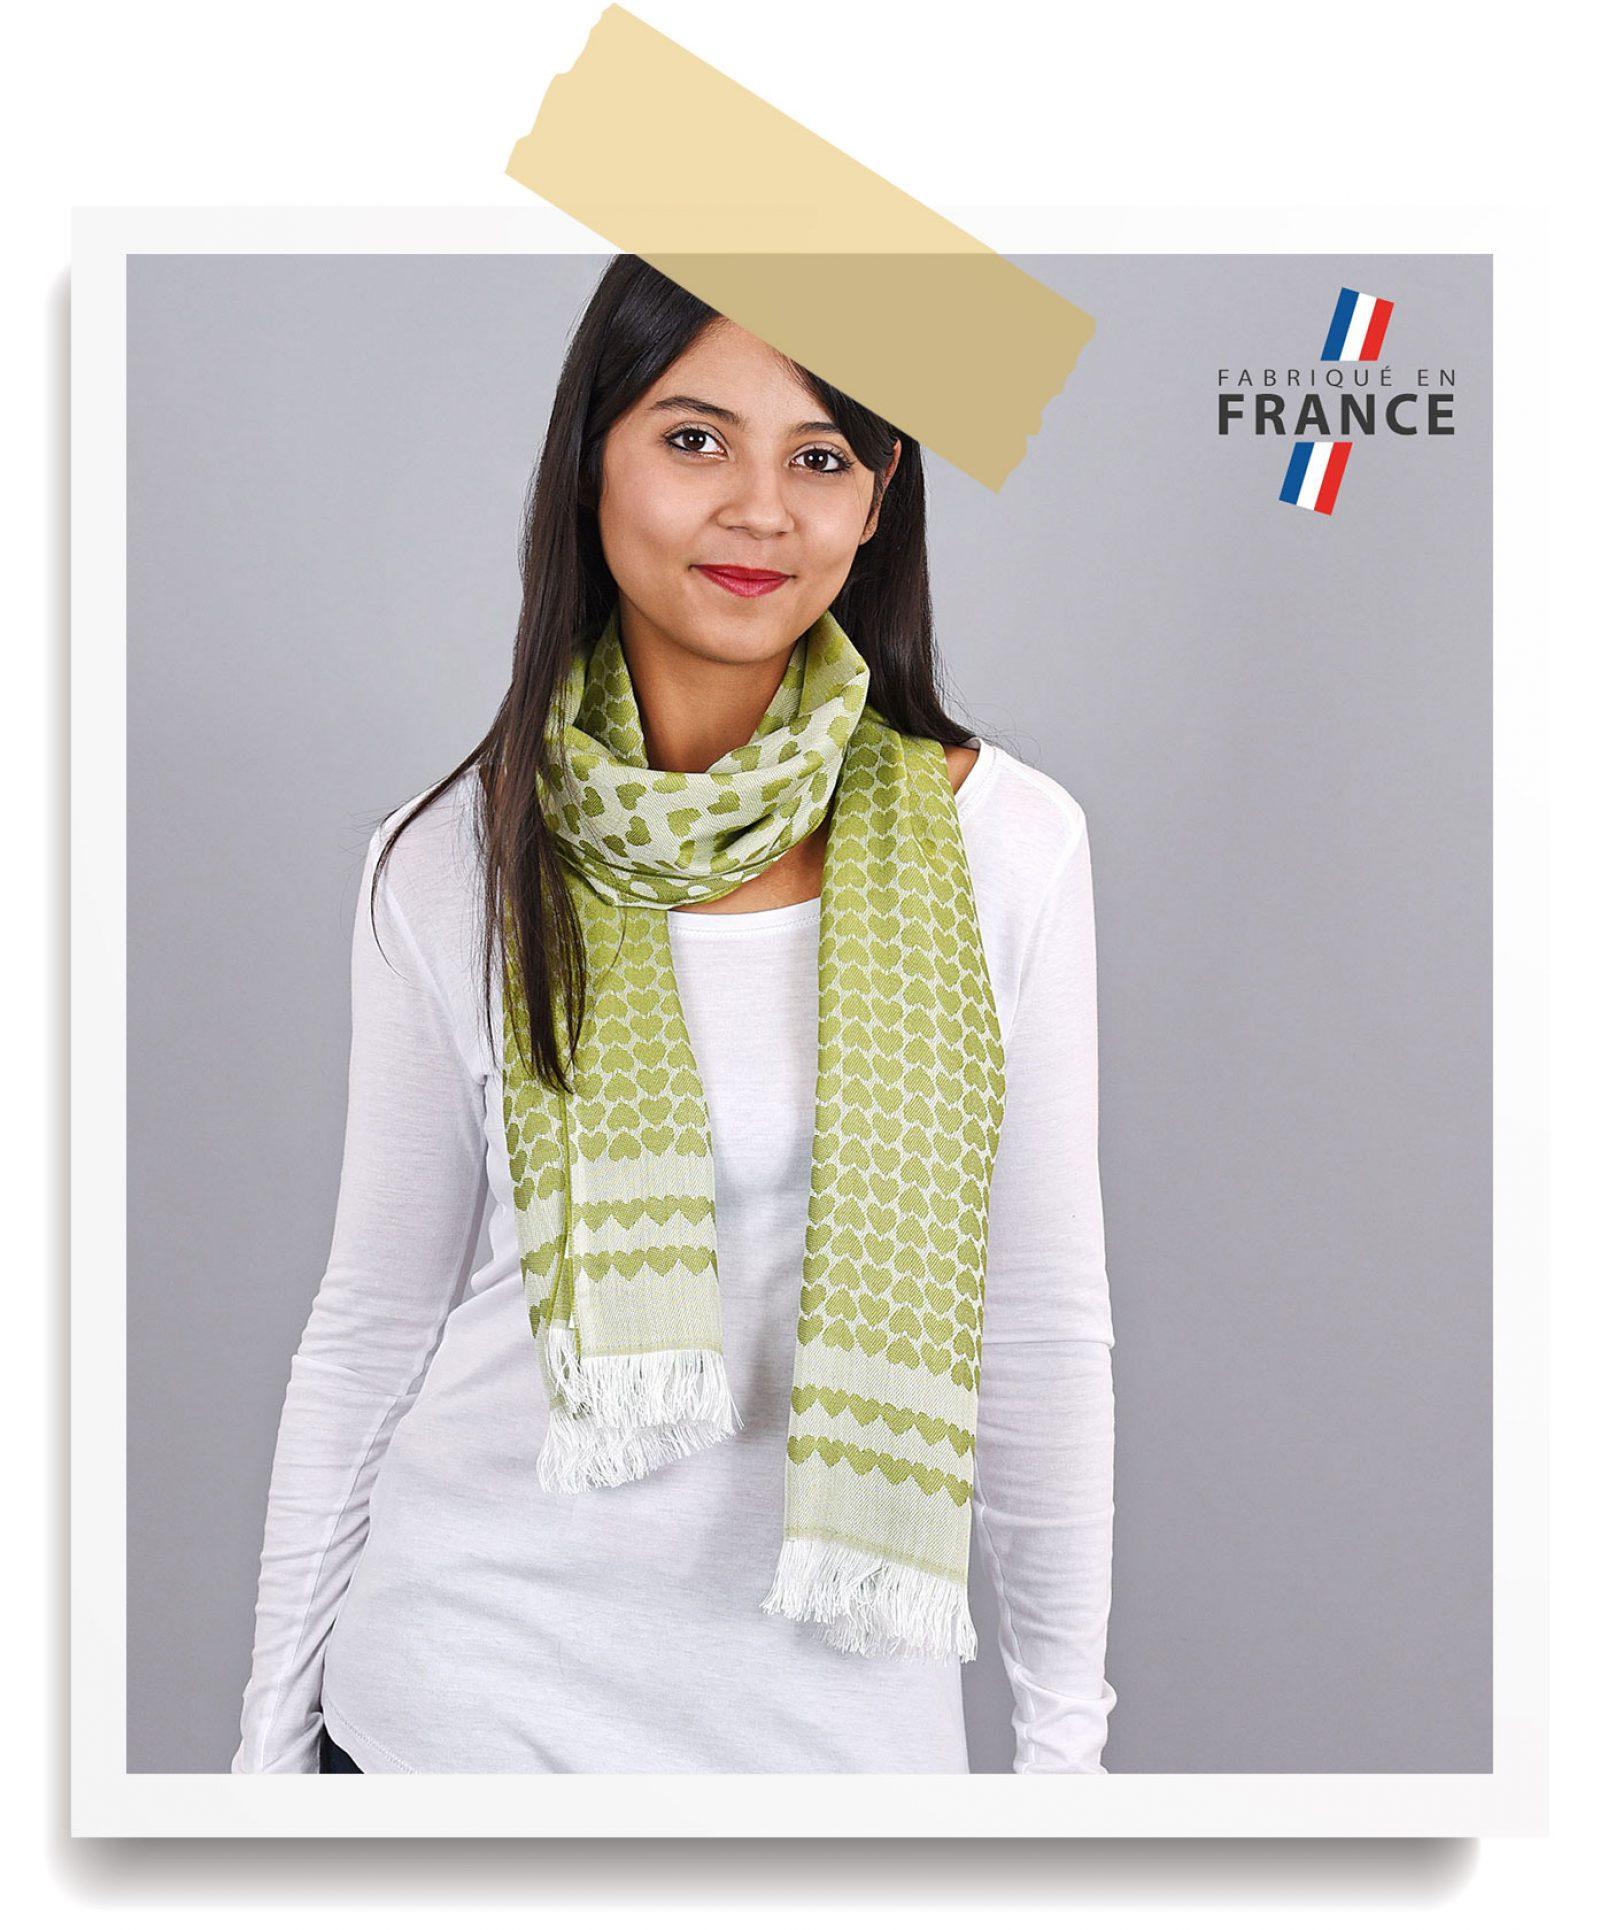 http://lookbook.allee-du-foulard.fr/wp-content/uploads/2018/06/0680-ADF-Accessoires-de-mode-LB-Soldes-Ete-echarpe-gadagne-1600x1930.jpg